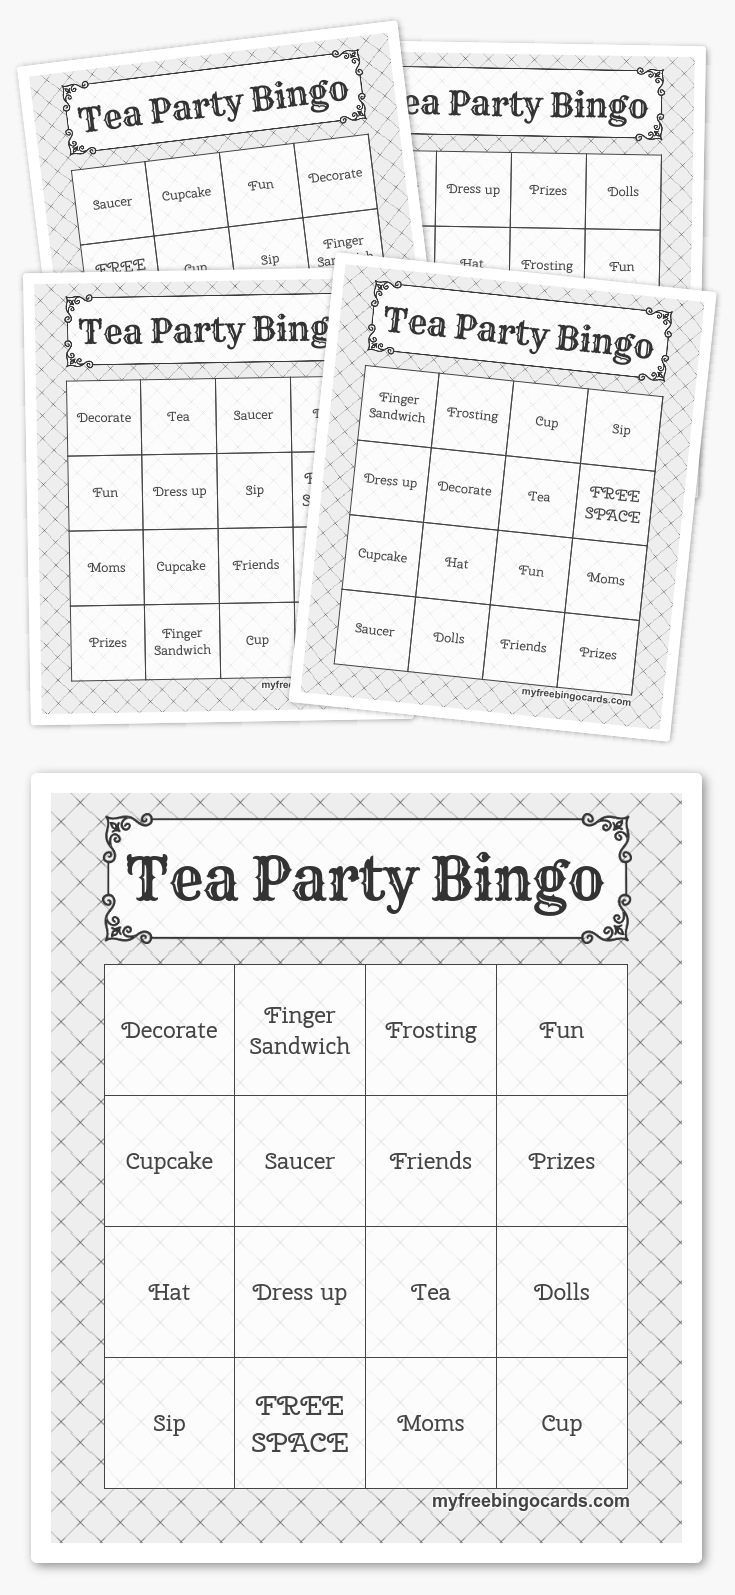 Free Printable Bingo Cards In 2019 | Printables | Harry Potter Games - Free Printable Tea Party Games